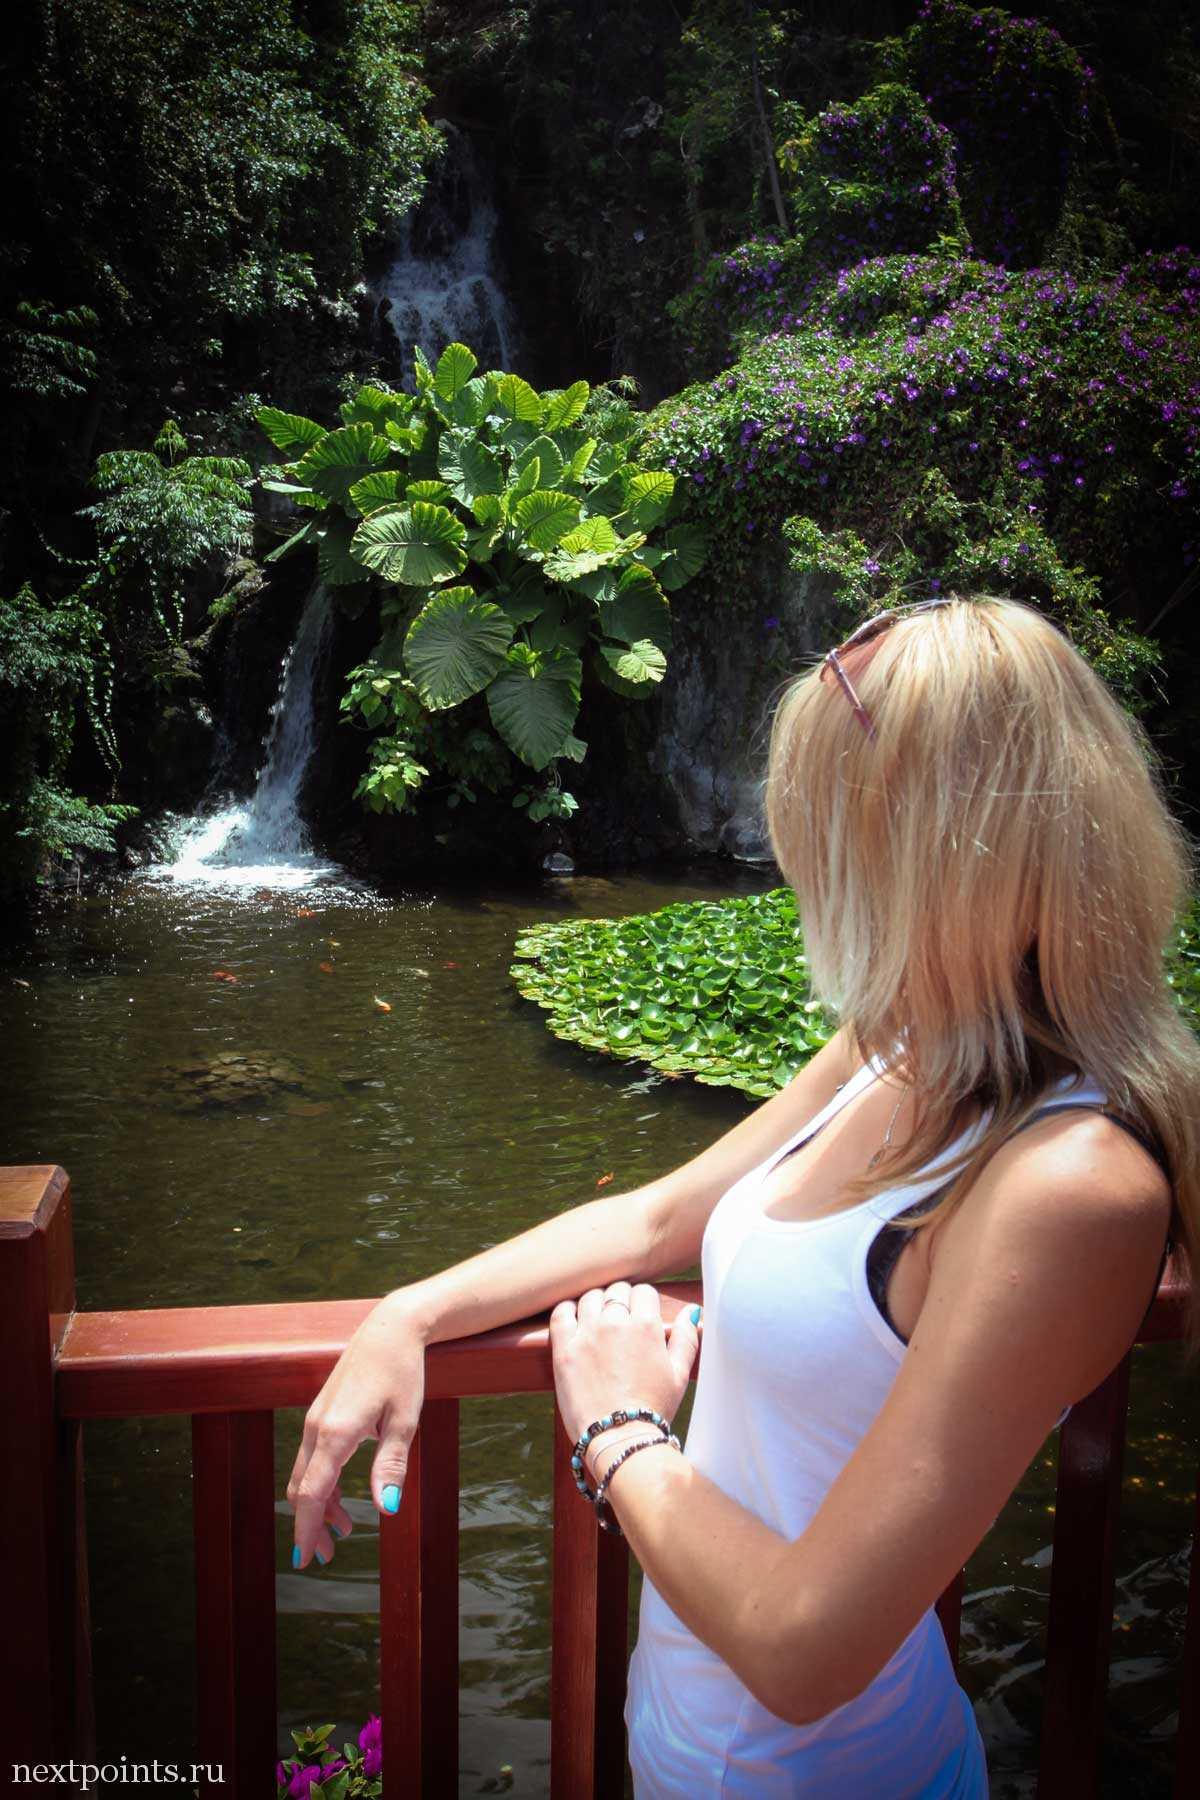 Водопад при входе в Лоро Парк (Loro Park)